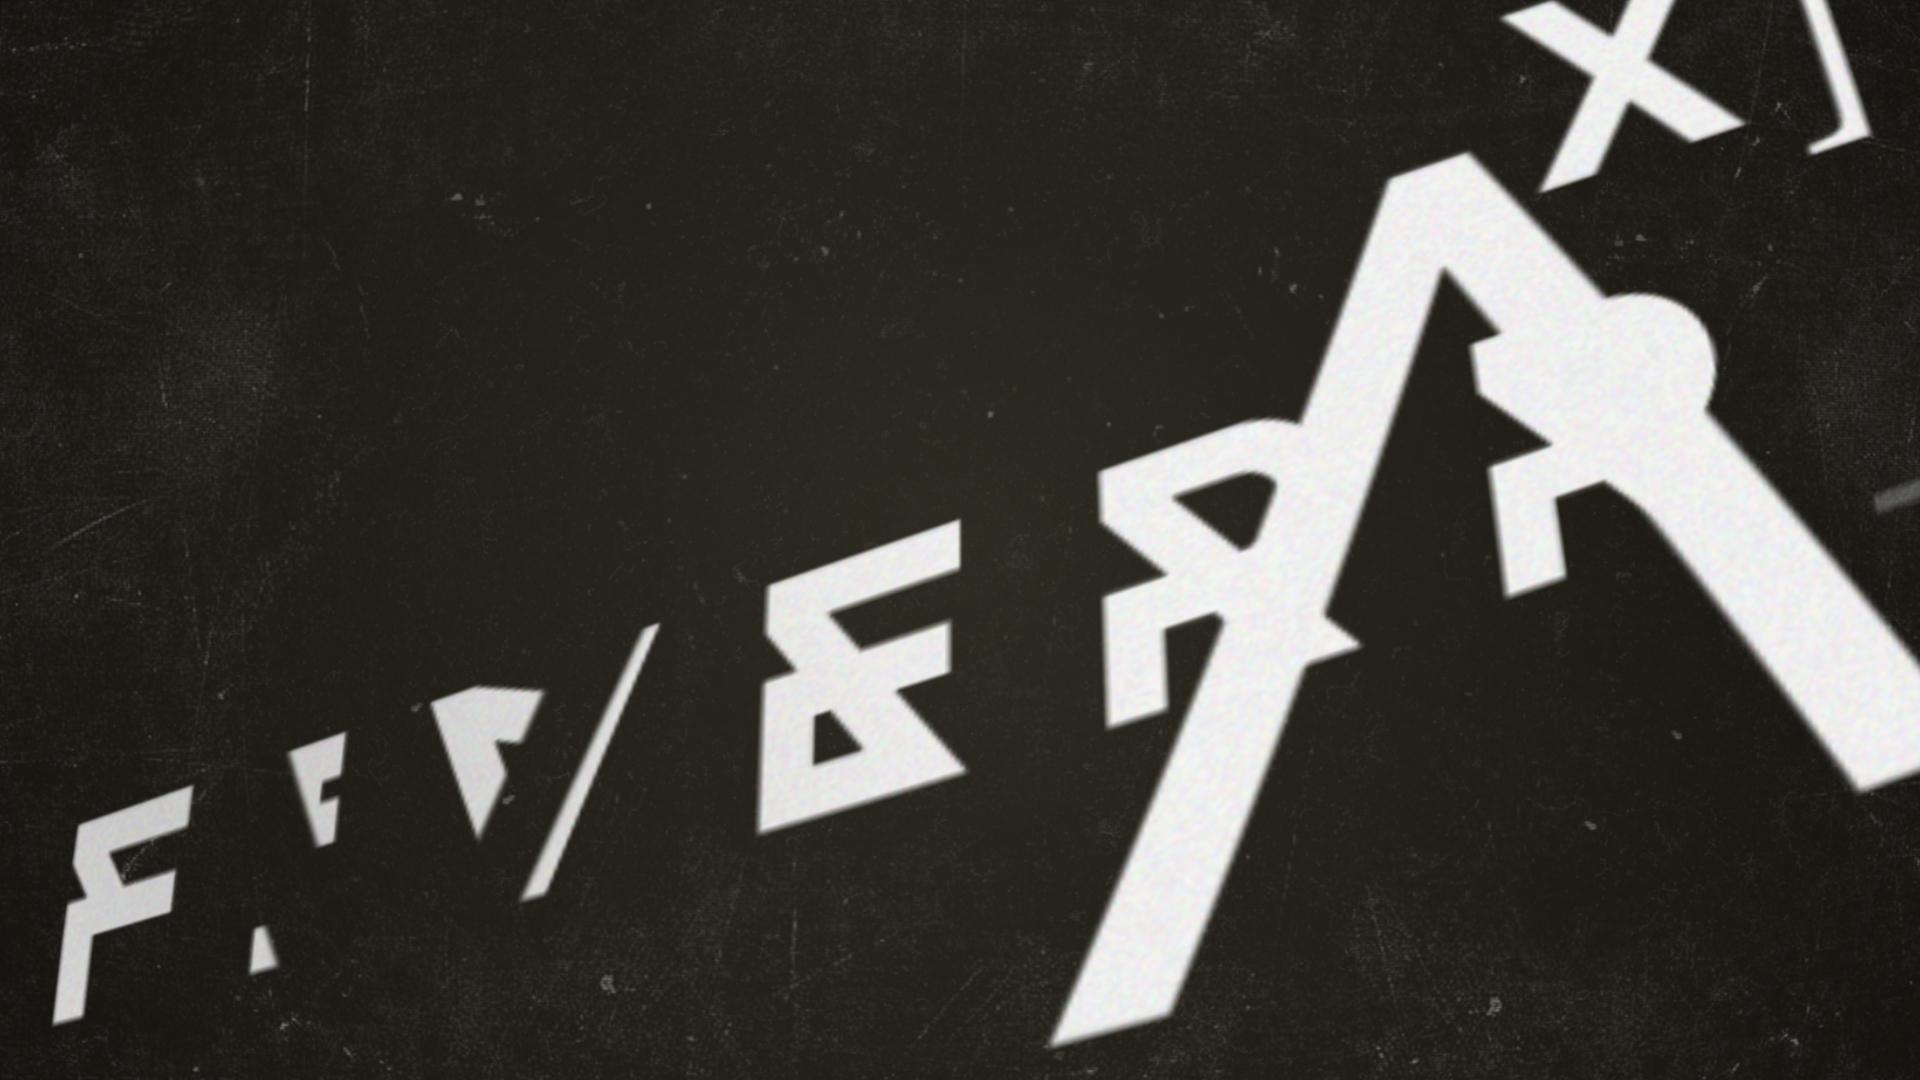 Glitch Text Decoder Intro Video Bumper By Room 4 Background Music